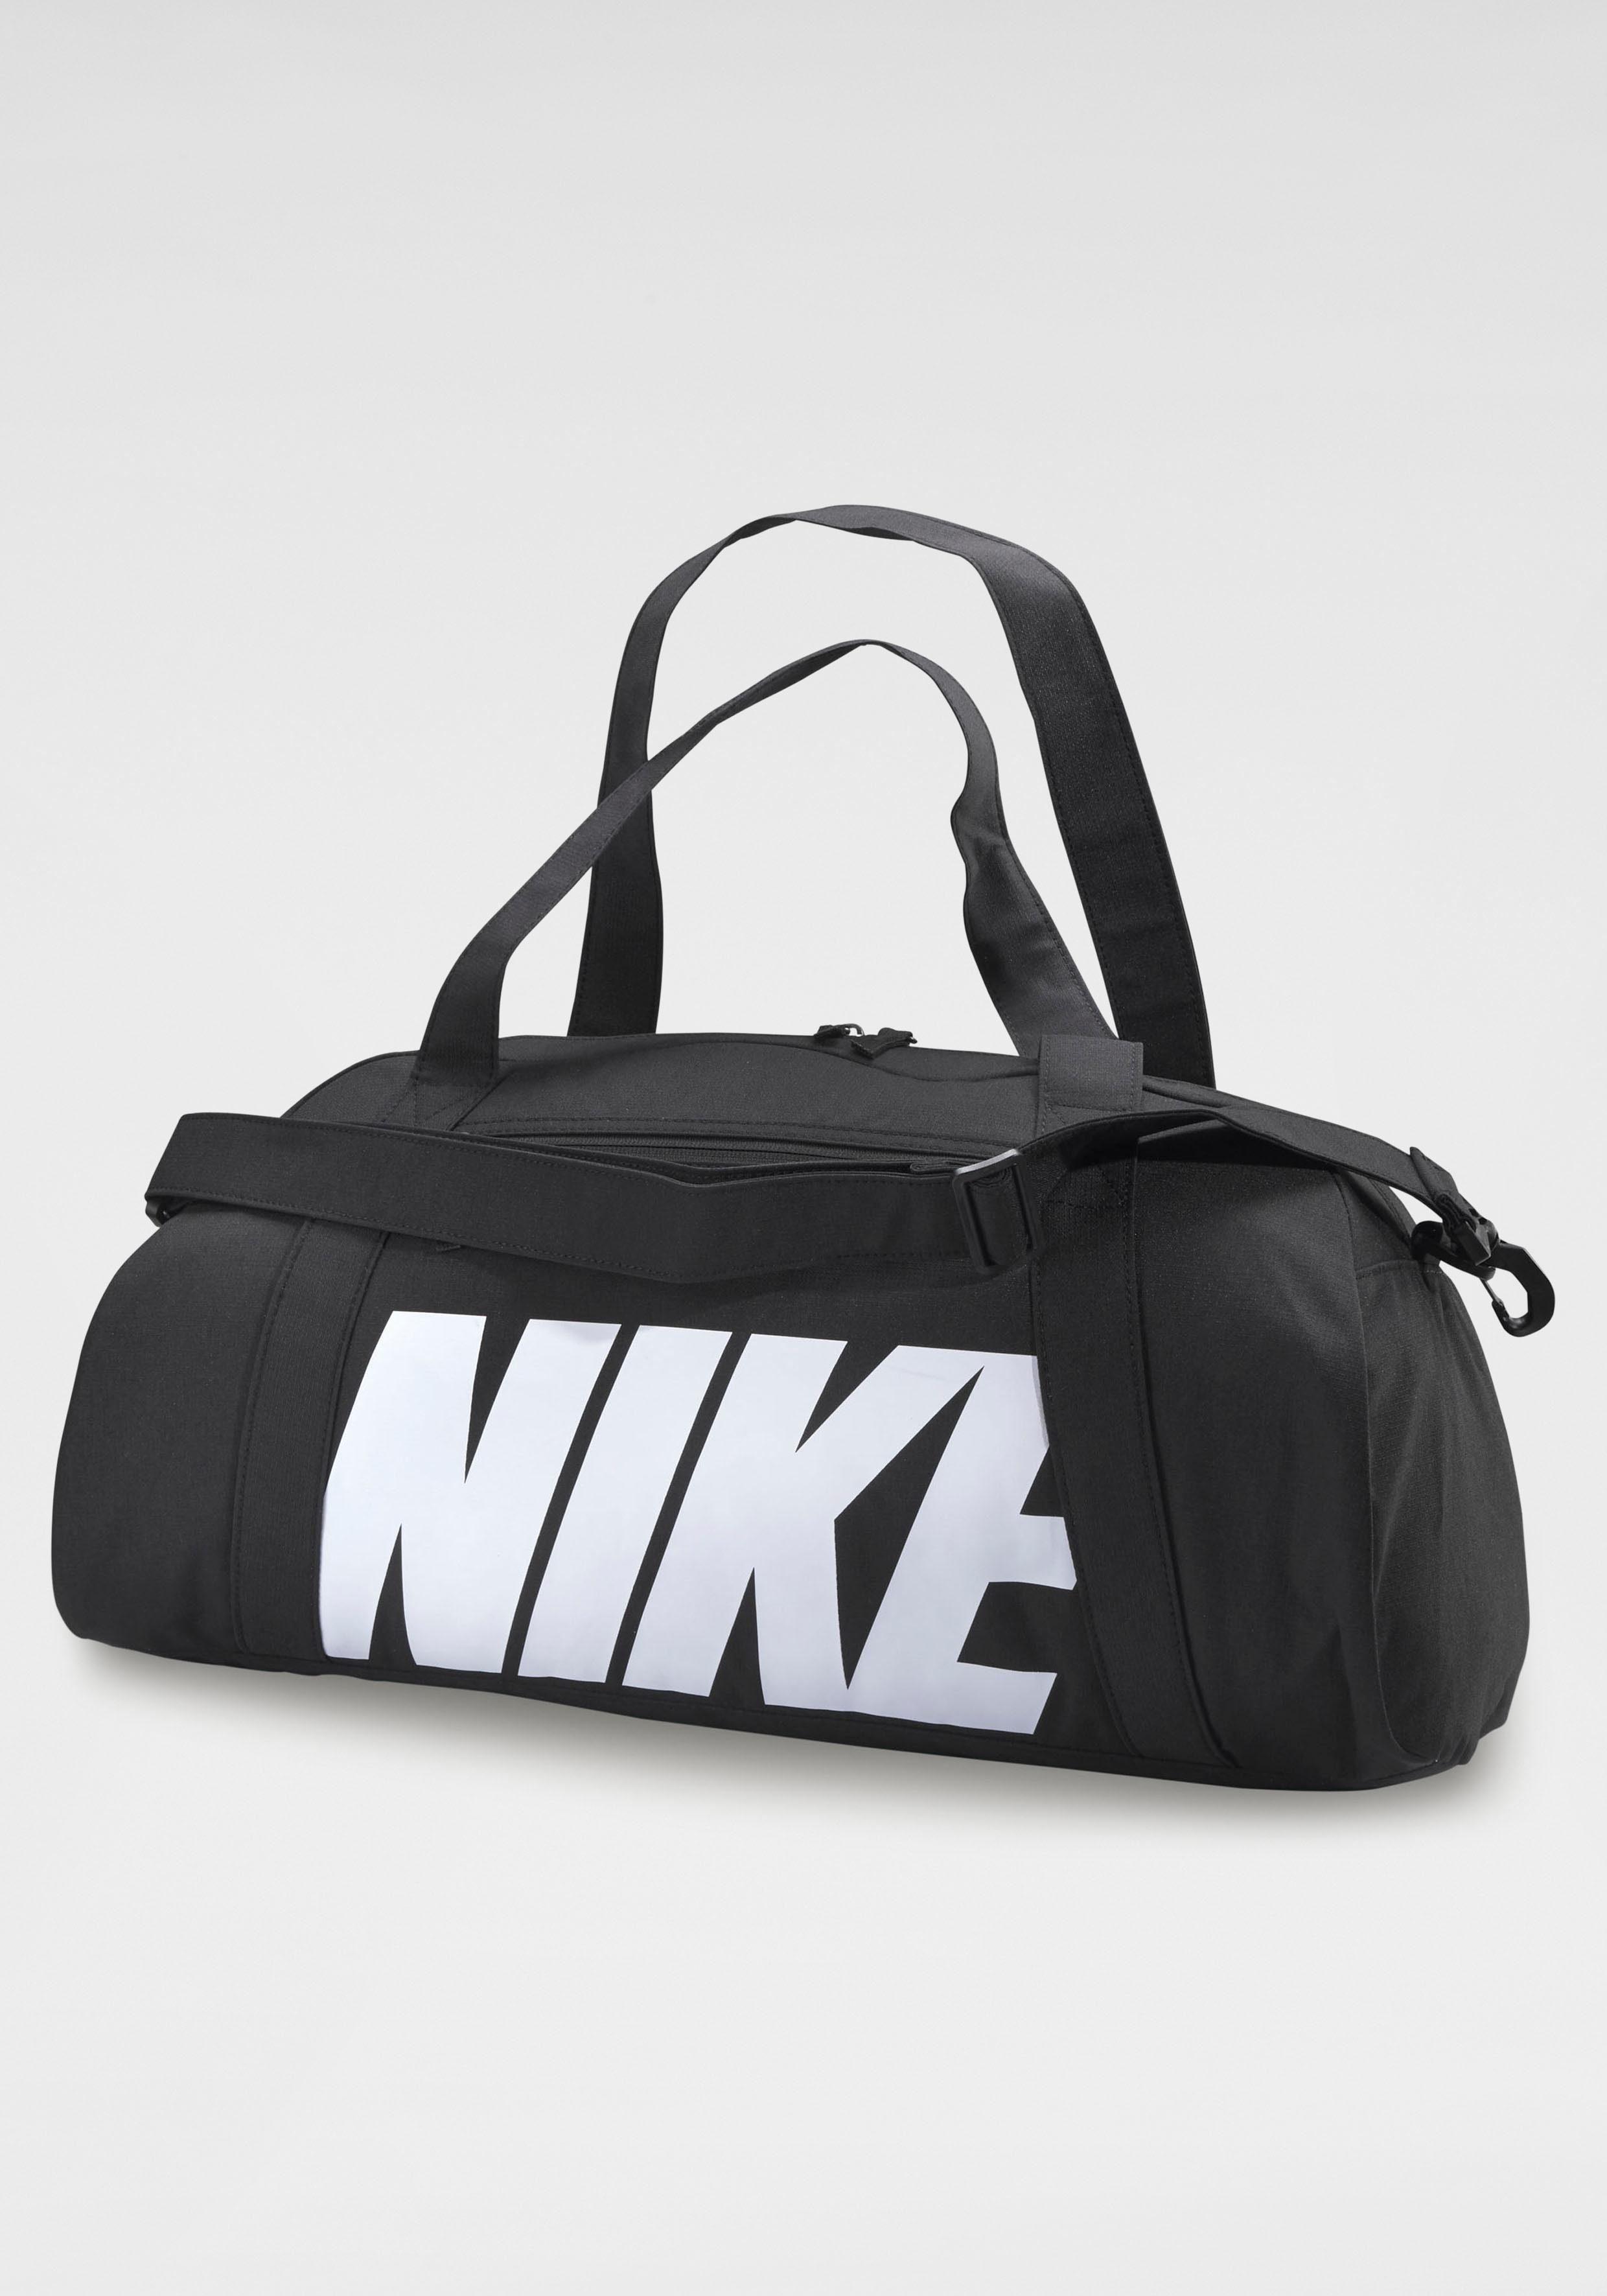 2603d0a4ae02e Nike - Black Sporttasche » GYM CLUB TRAINING DUFFEL BAG« for Men - Lyst.  Vollbild ansehen